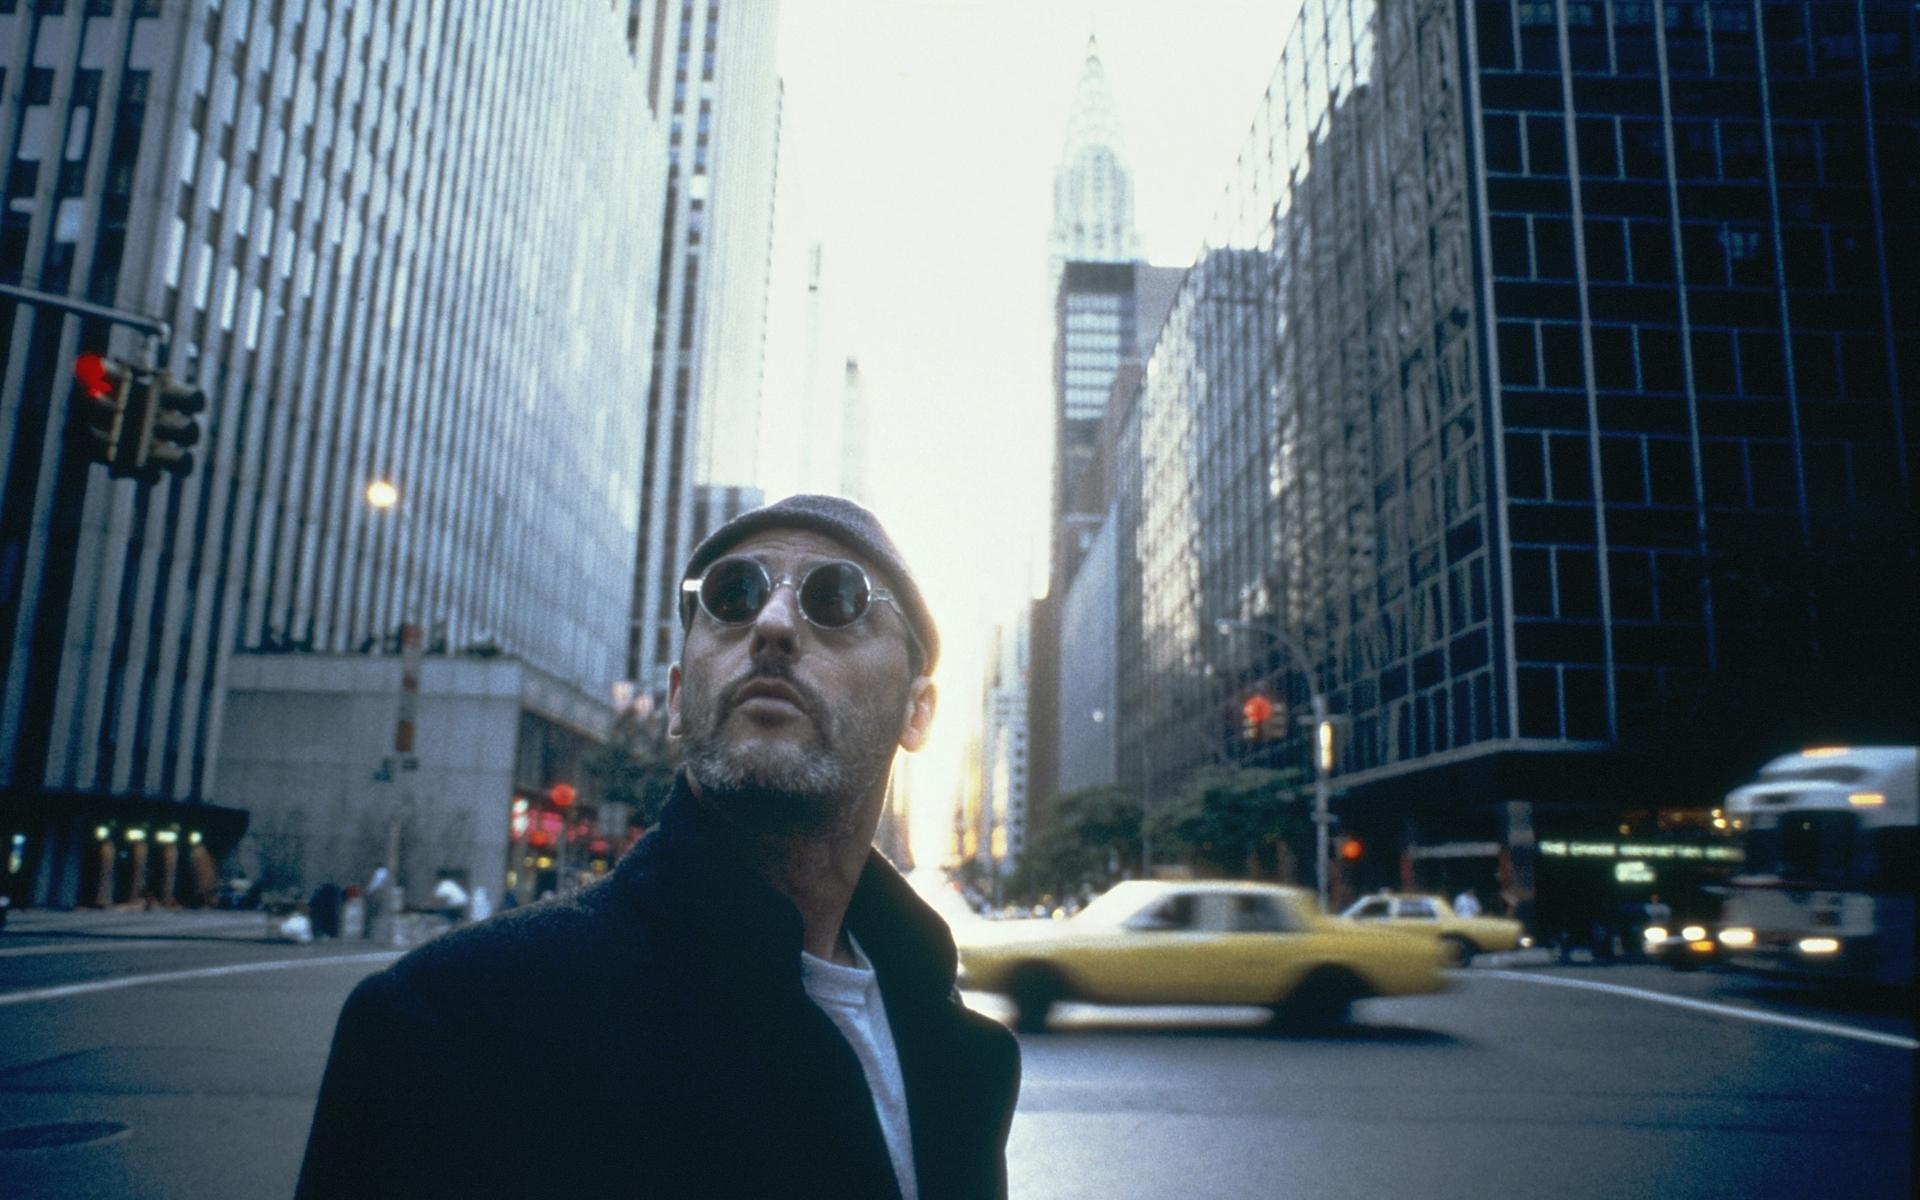 streets, cars, leon the professional, jean reno, sunglasses